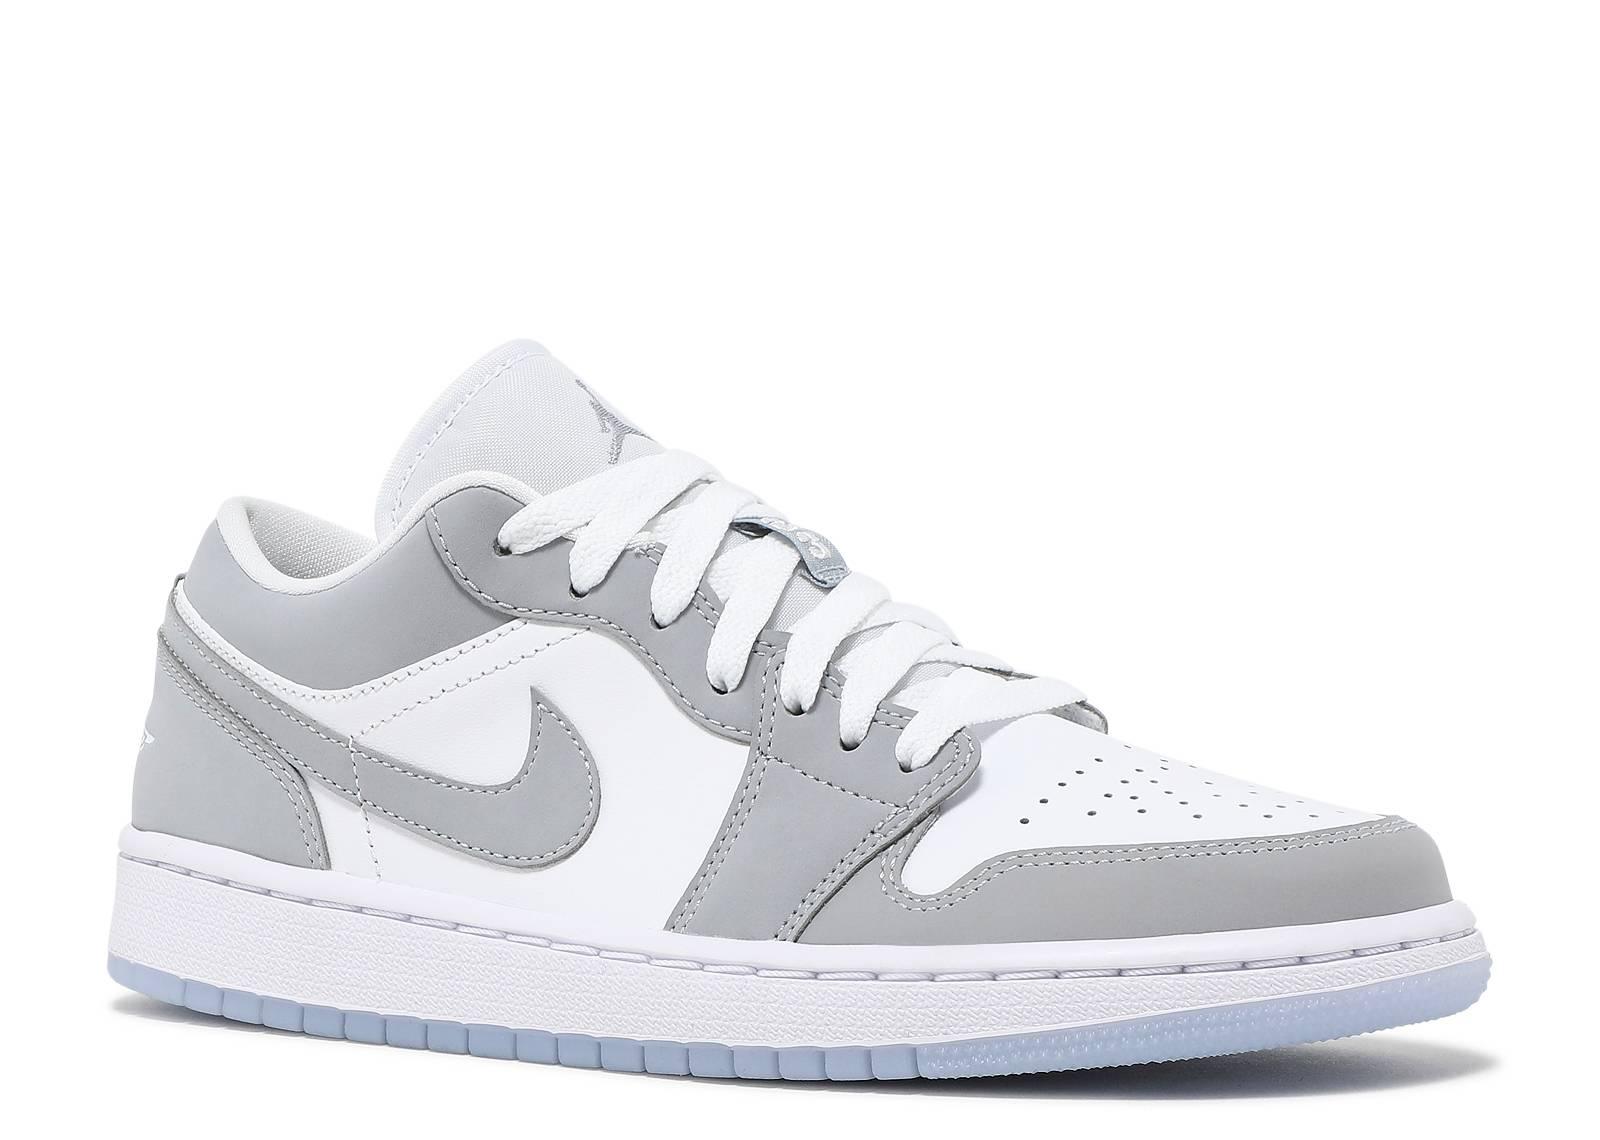 Wmns Air Jordan 1 Low 'White Wolf Grey'